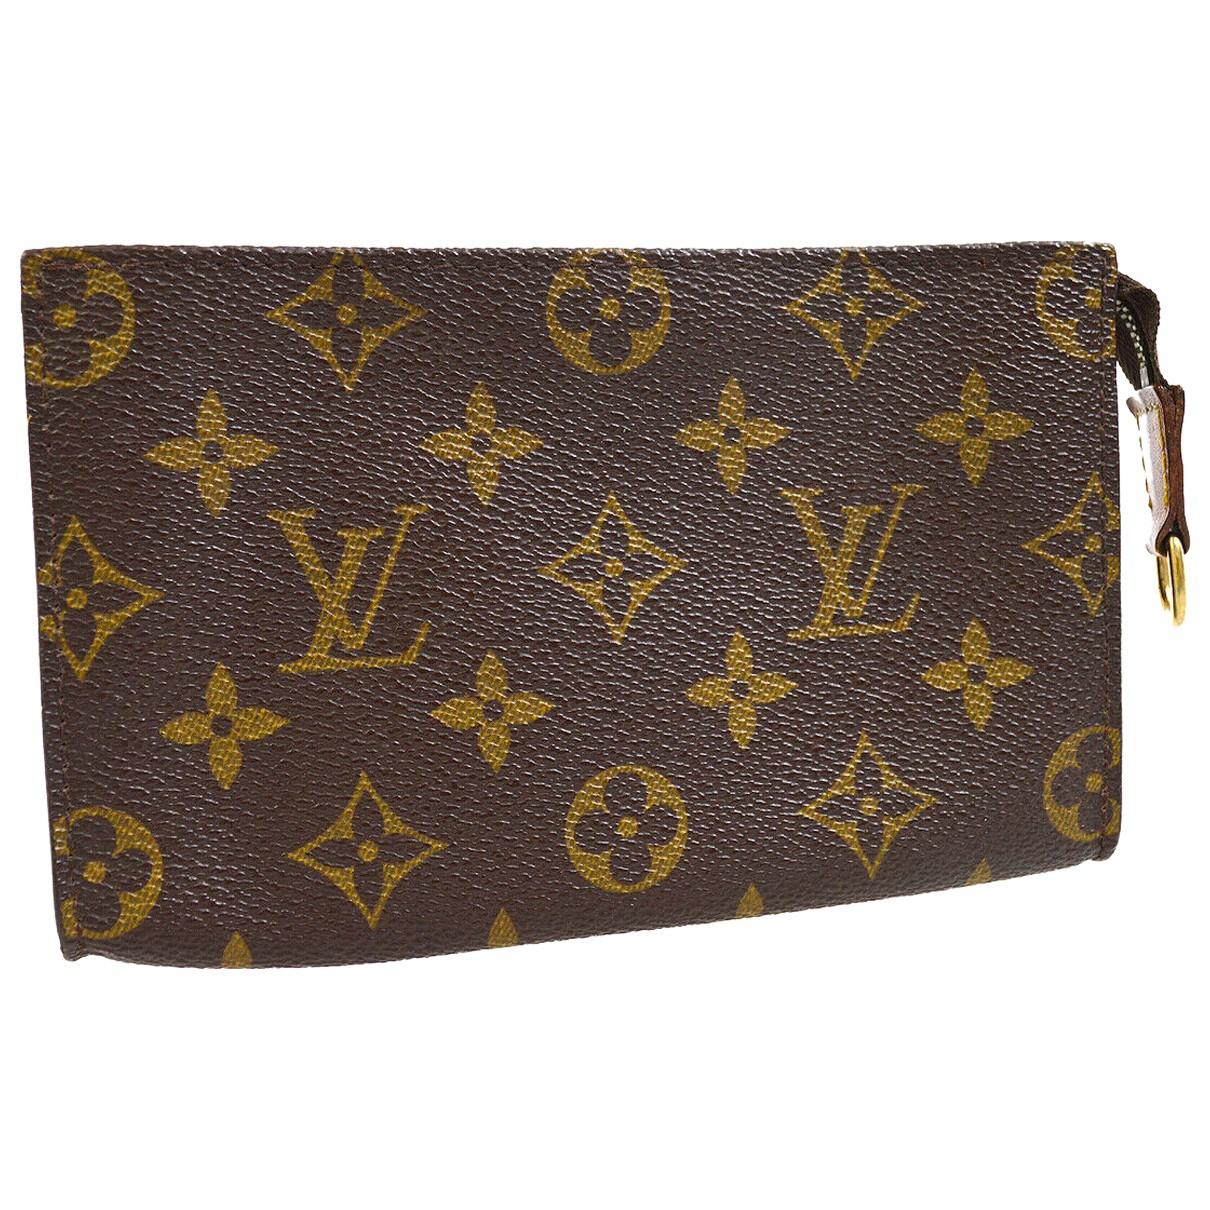 Louis Vuitton N Leather Purses, wallet & cases for Women N